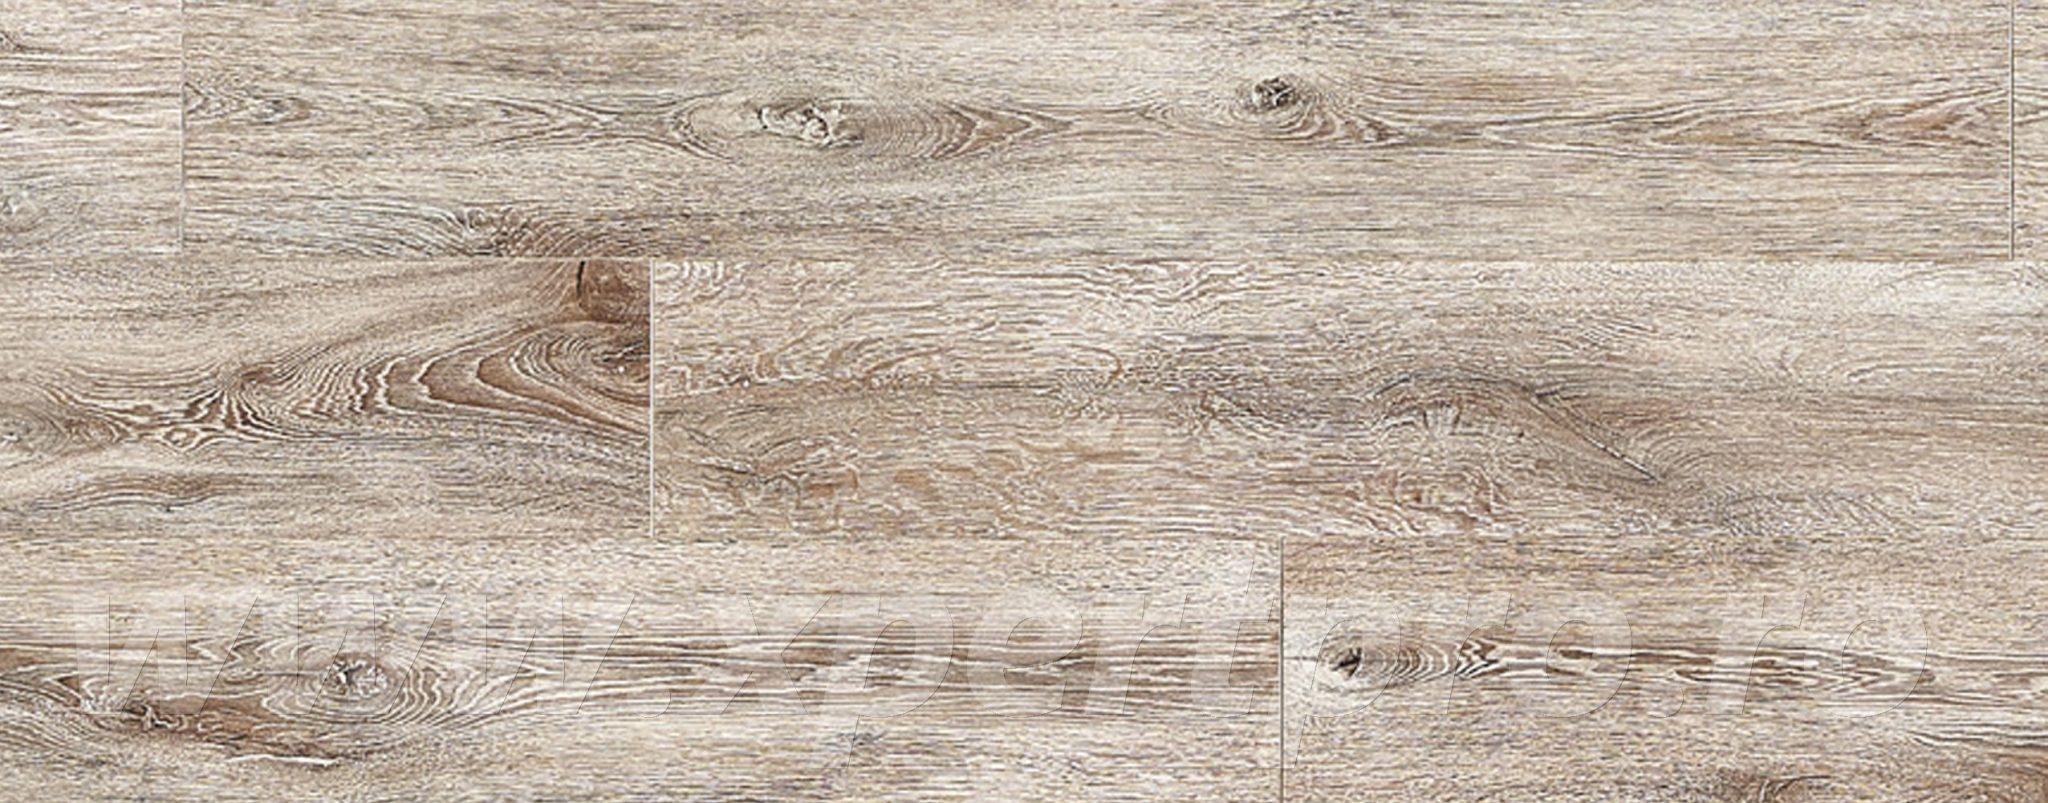 Parchet Laminat Xpert Pro 020 Montana Oak